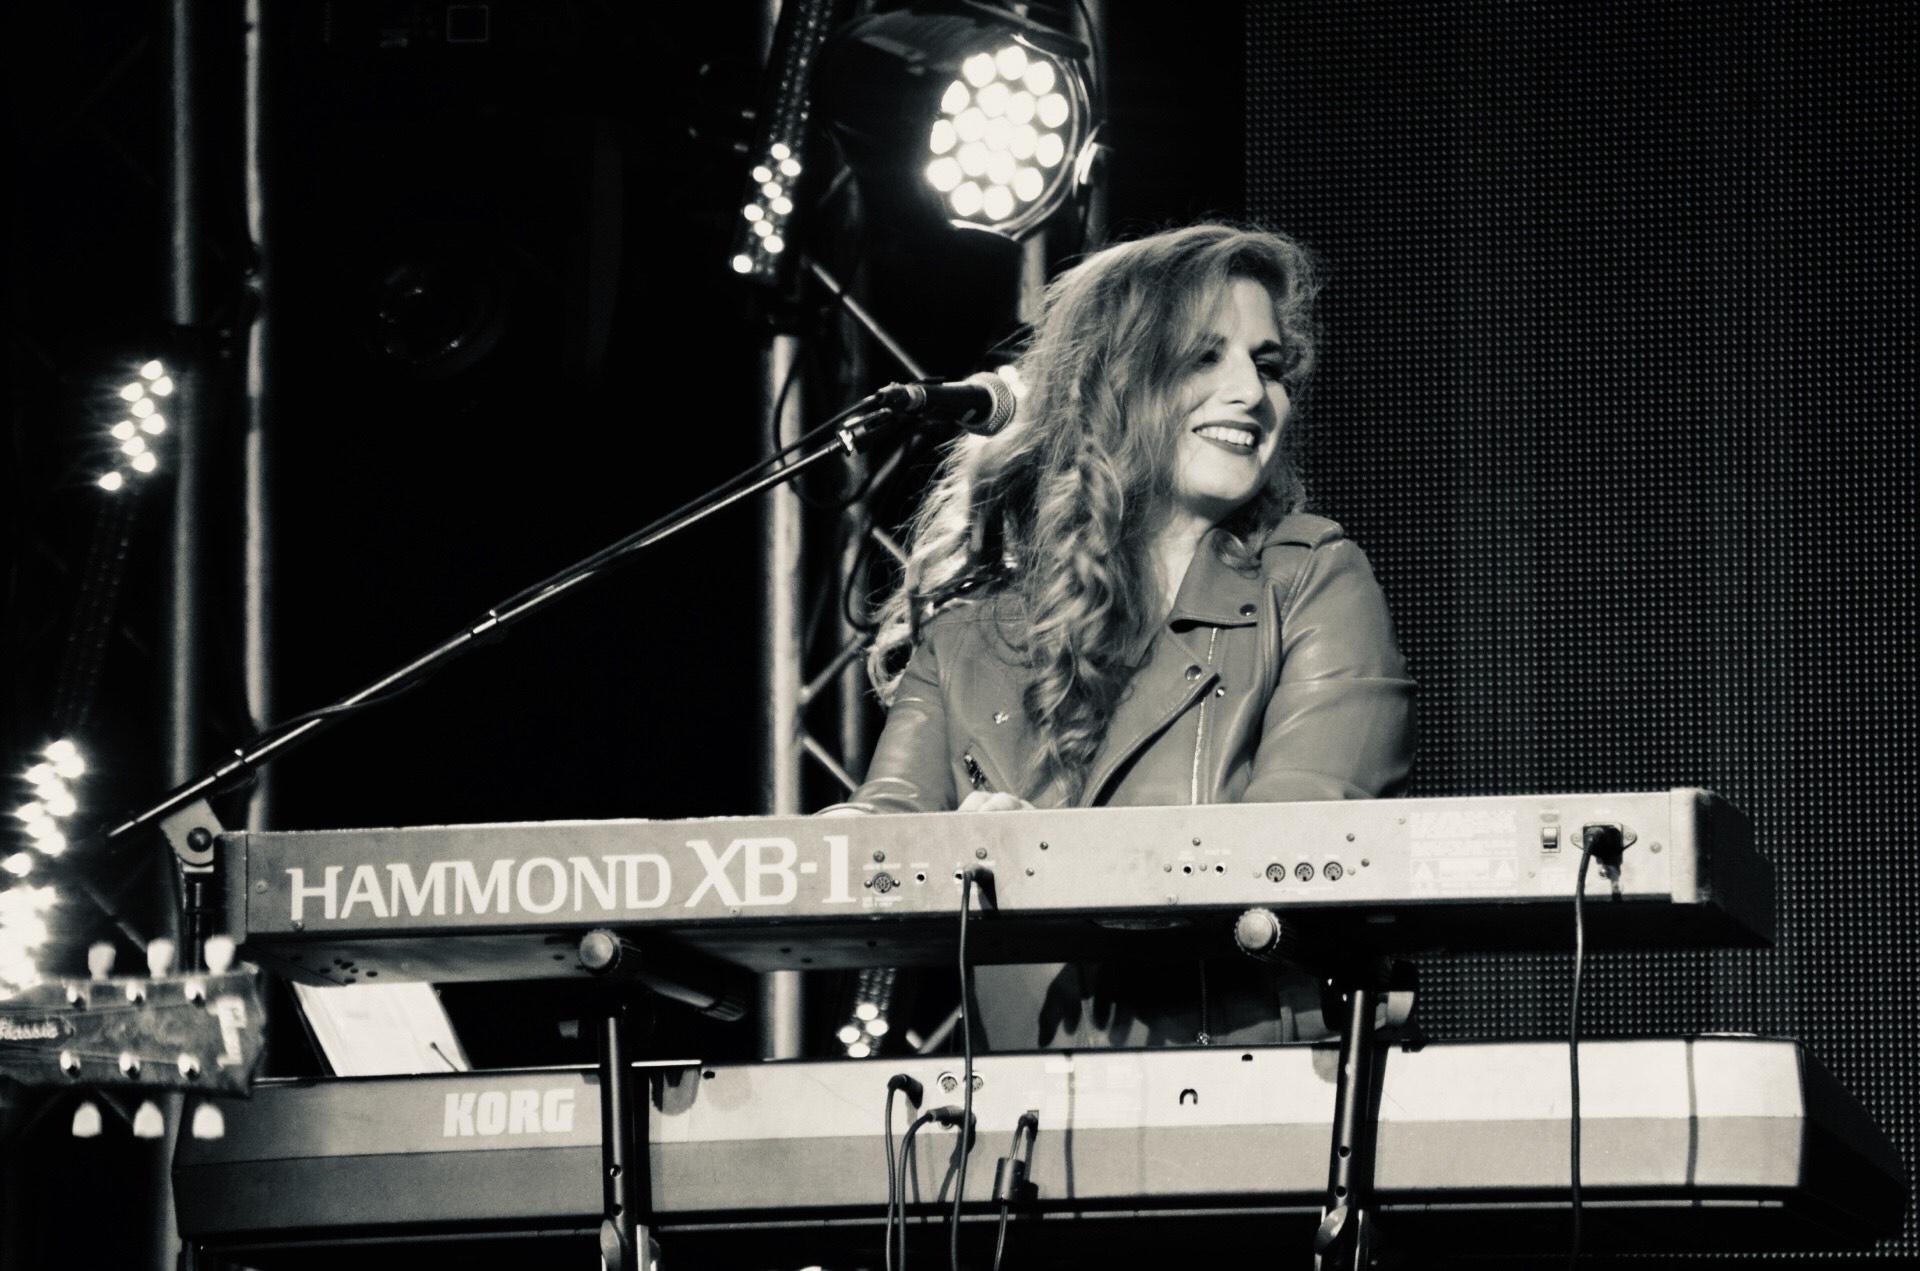 Gerendás Hanna zongora